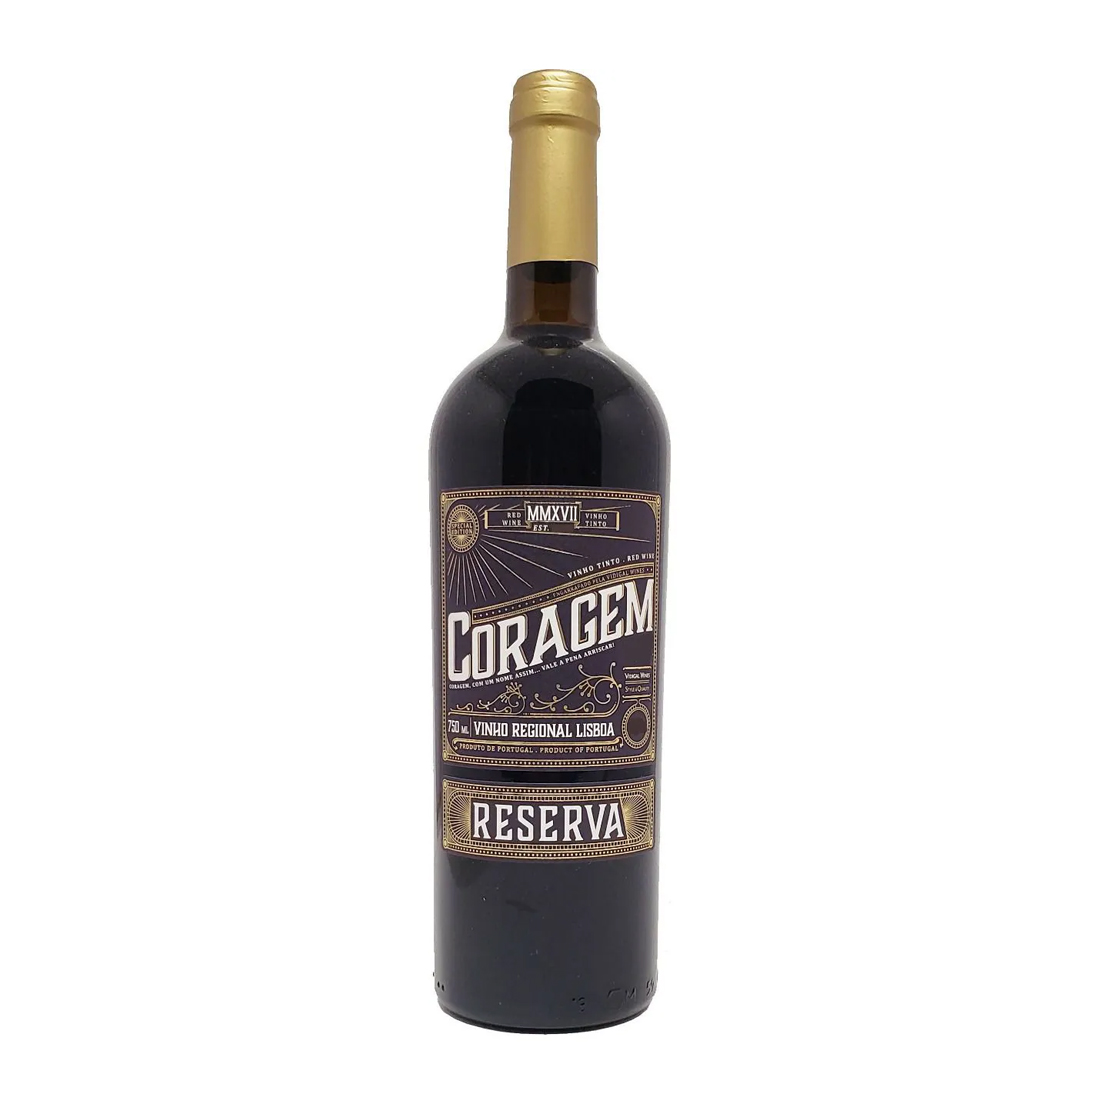 Vinho Coragem Reserva Regional Lisboa 750ml